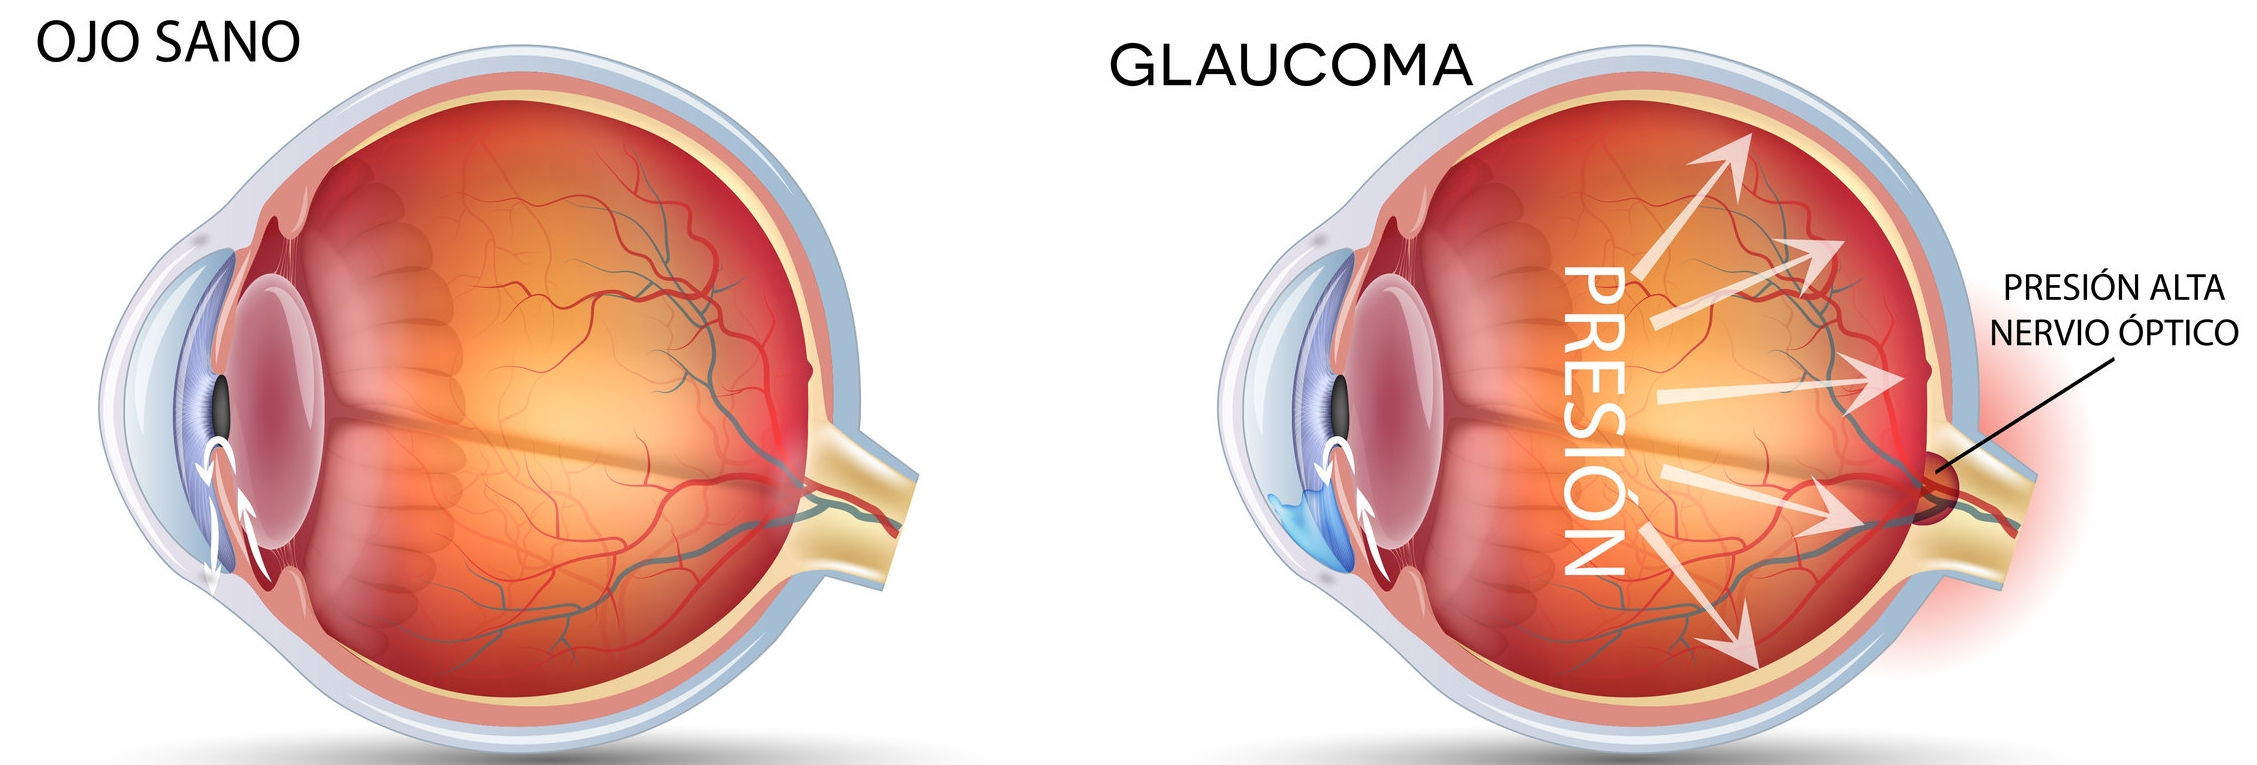 omiq_oftalmologia_medica_glaucoma-1.jpg